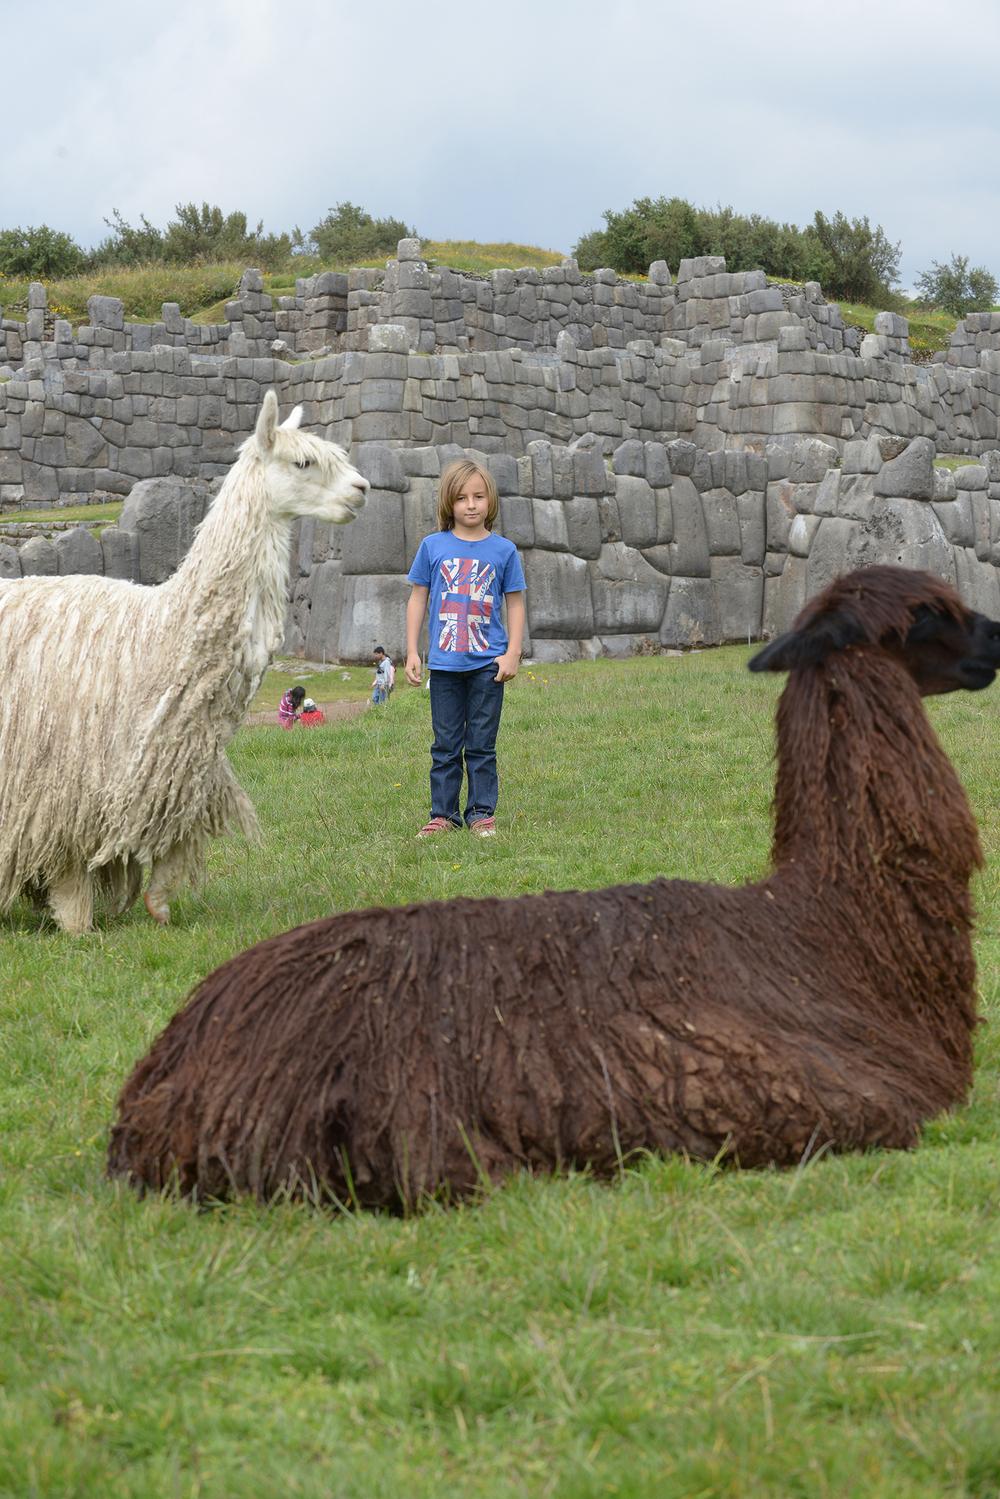 blogi, matkablogi, laama, Peru, Andit, Machu Picchu, Cuzco, lomamatkat, alpakka